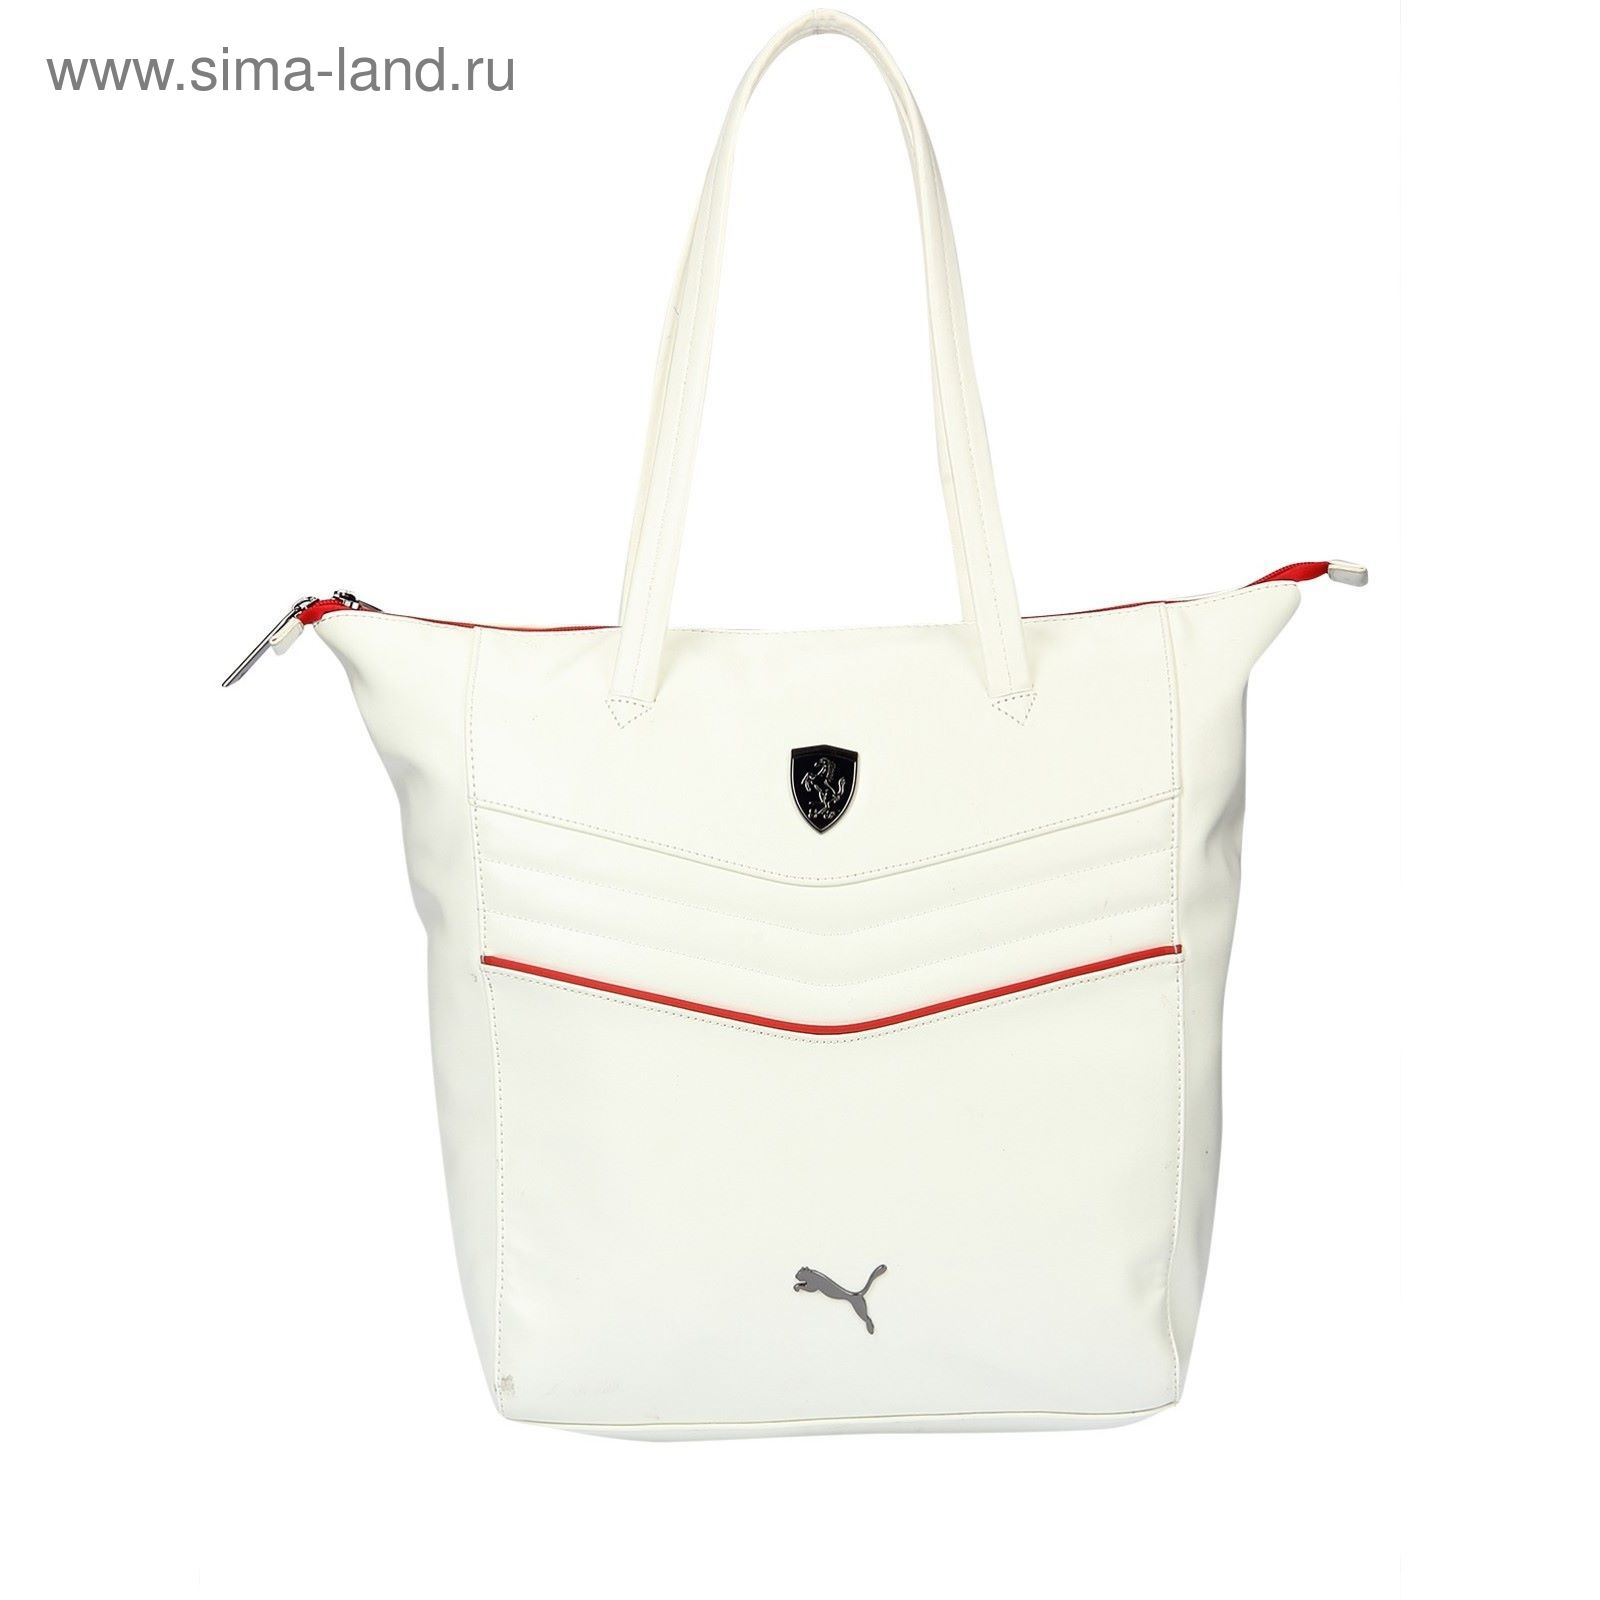 6cf76f6a5f30 Сумка женская PUMA Ferrari LS Shopper, цвет белый (2350319) - Купить ...